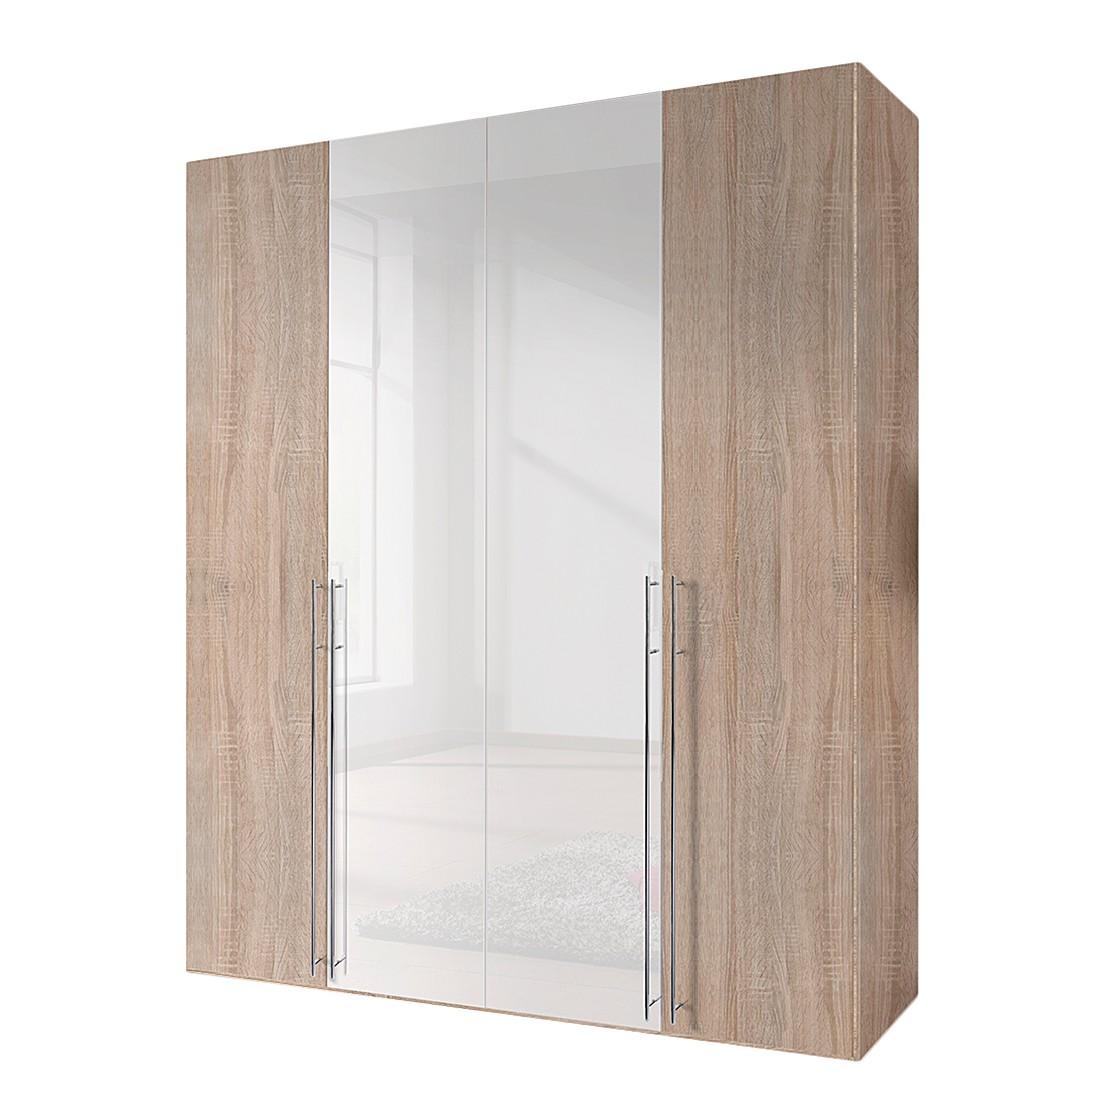 Armoire à portes battantes Brooklyn VIII - Imitation chêne de Sonoma / Vernis blanc - 100 cm (2 port